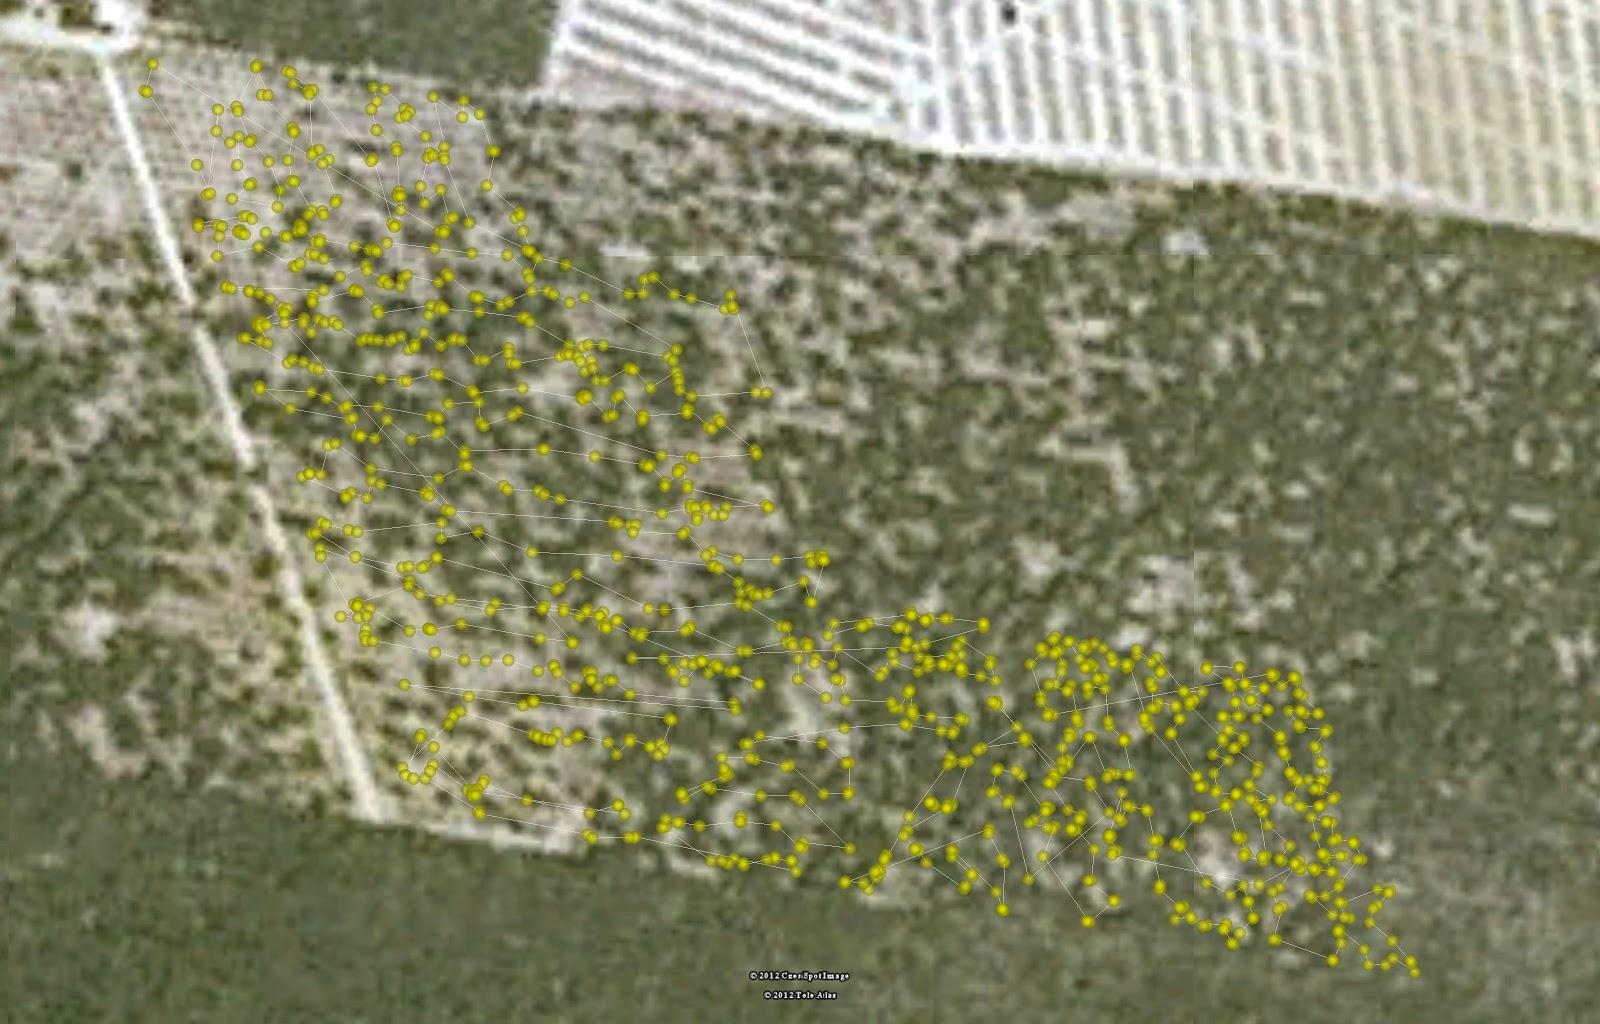 devWorks: เก็บตัวอย่างภาคพื้นดินด้วย GPS Surveyor